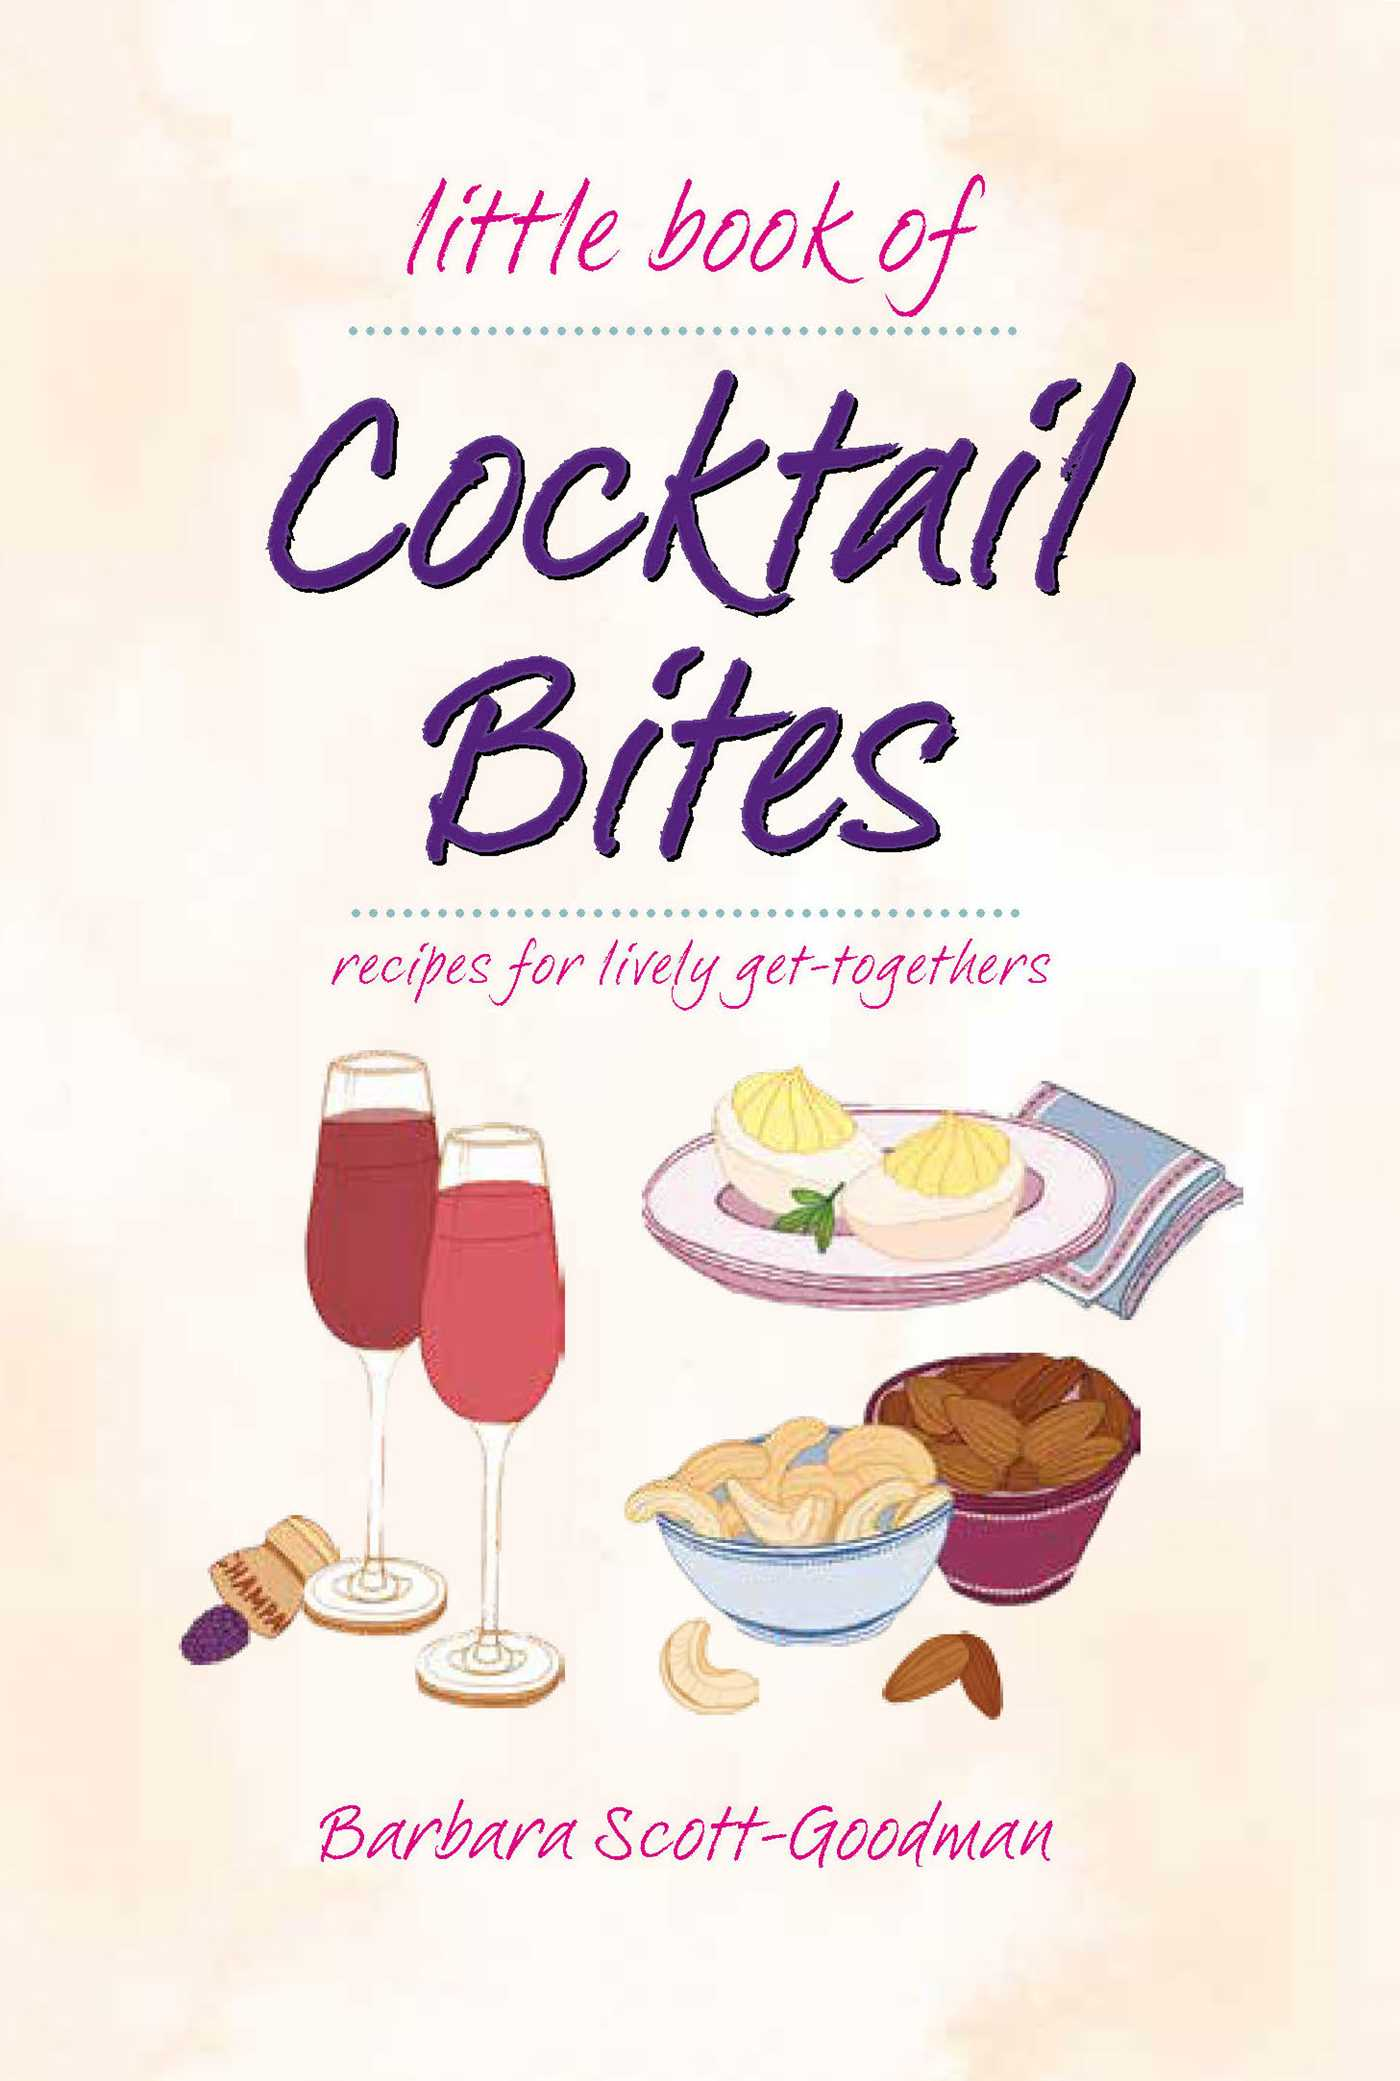 Little book of cocktail bites 9781681884387 hr